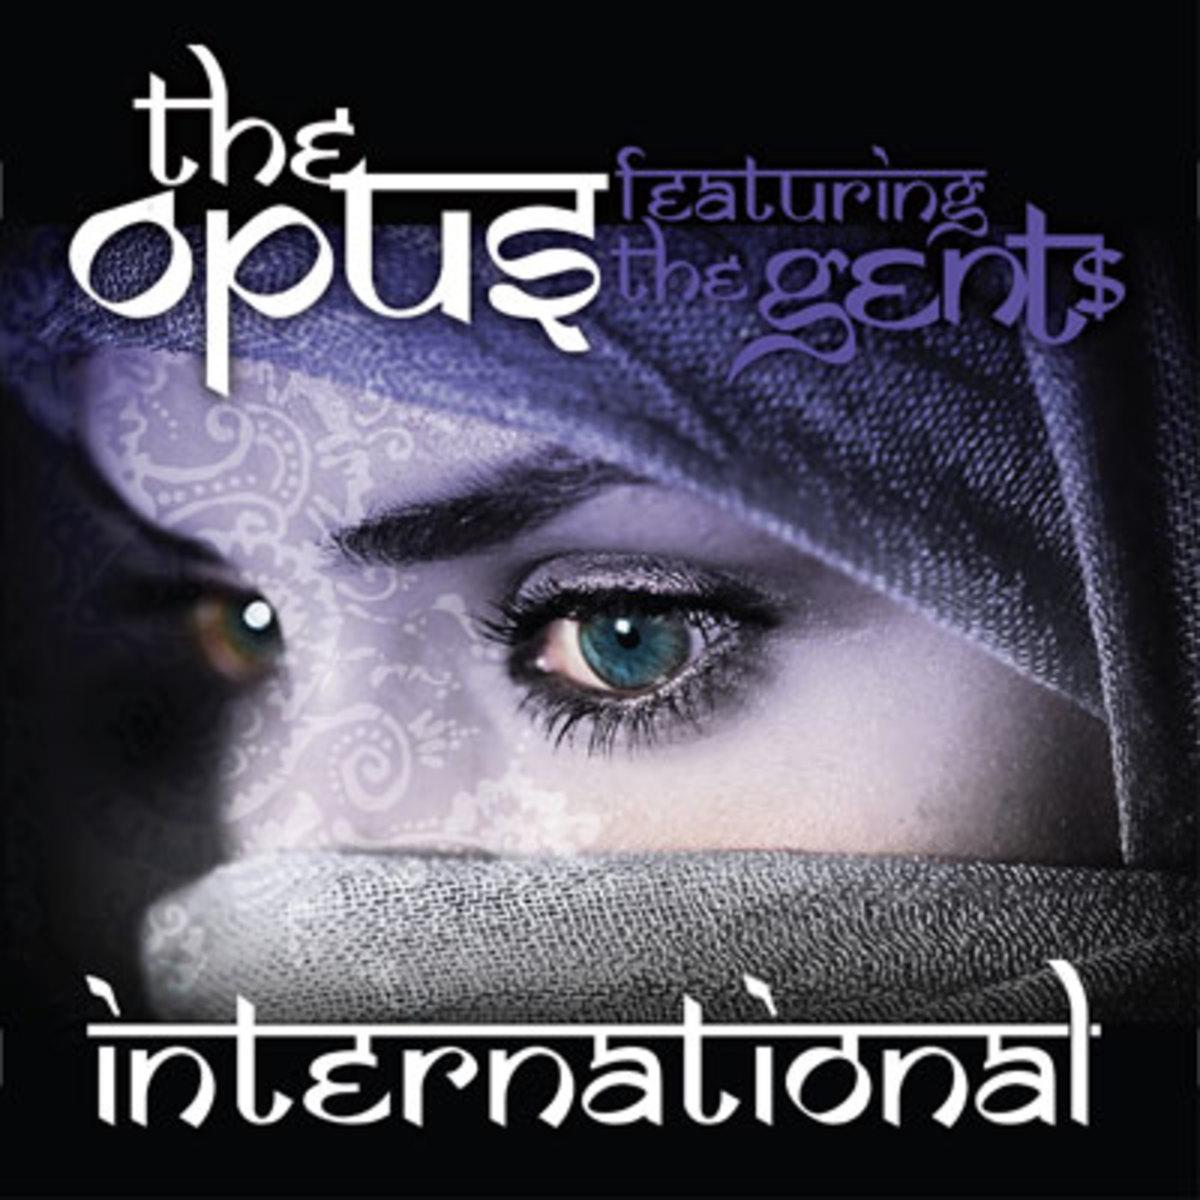 theopus-international.jpg